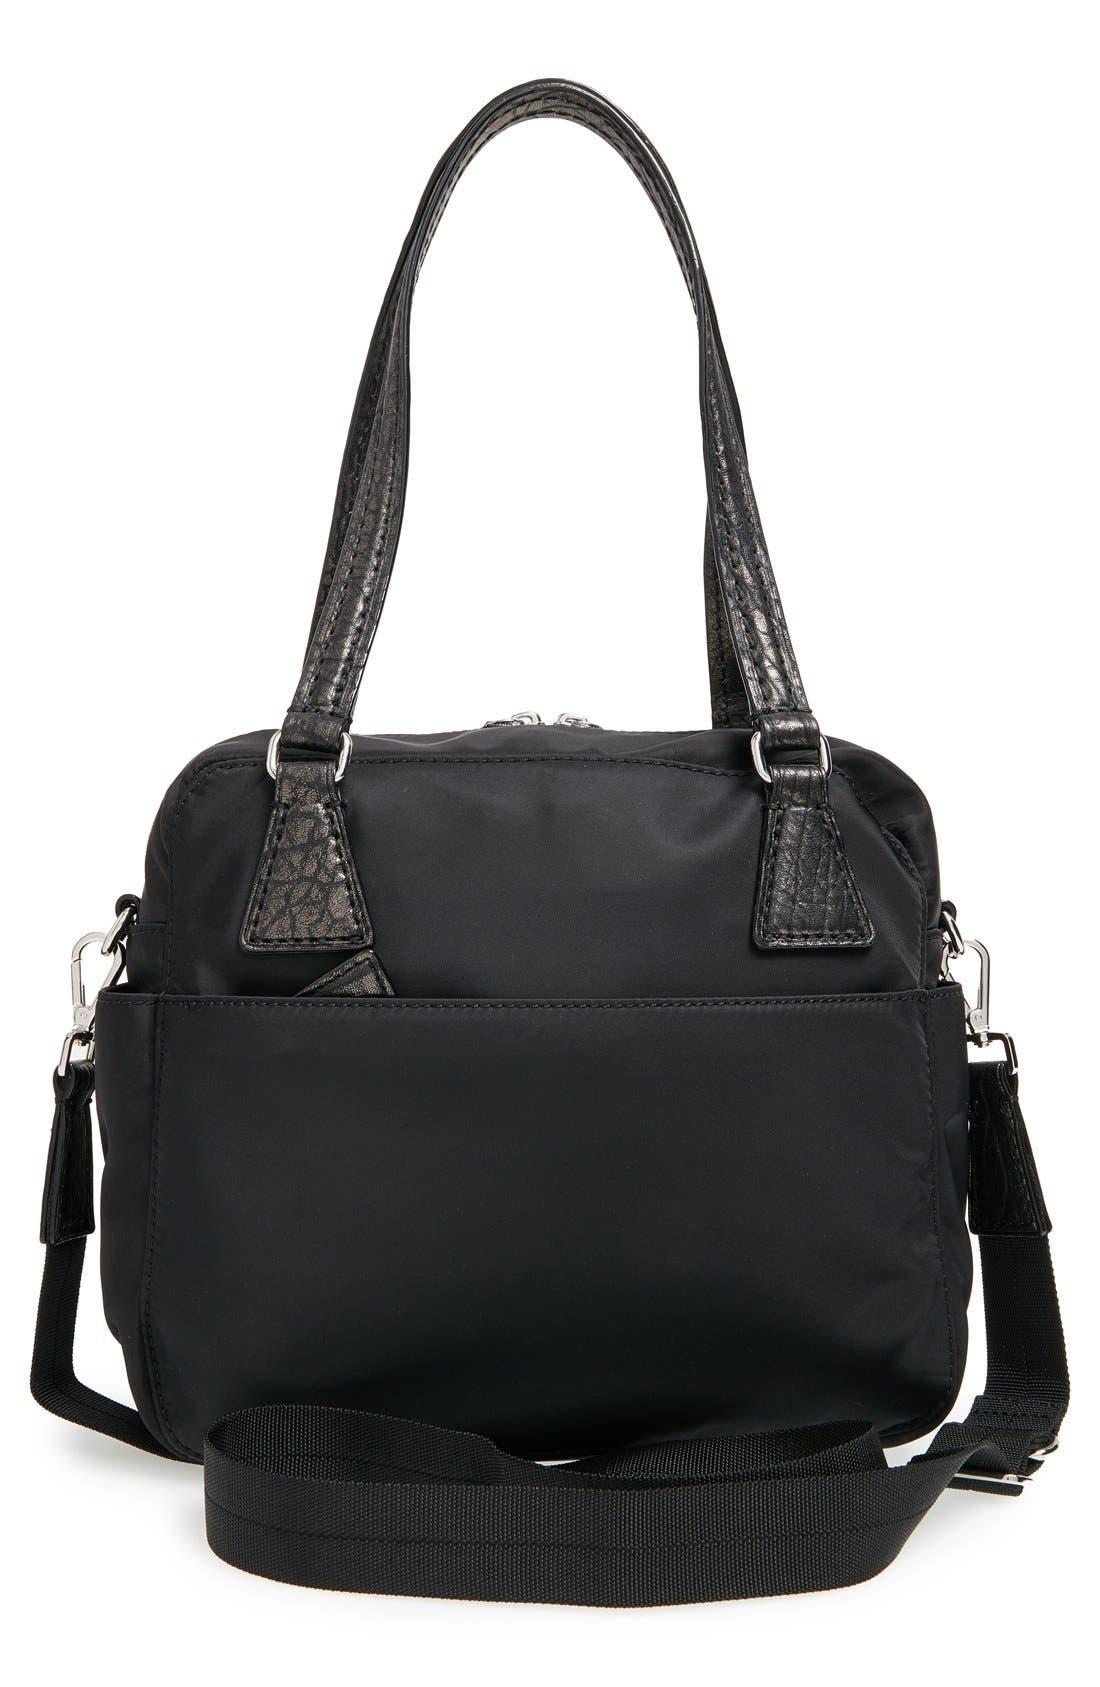 'Small Roxy' Bedford Nylon Shoulder Bag,                             Alternate thumbnail 3, color,                             001